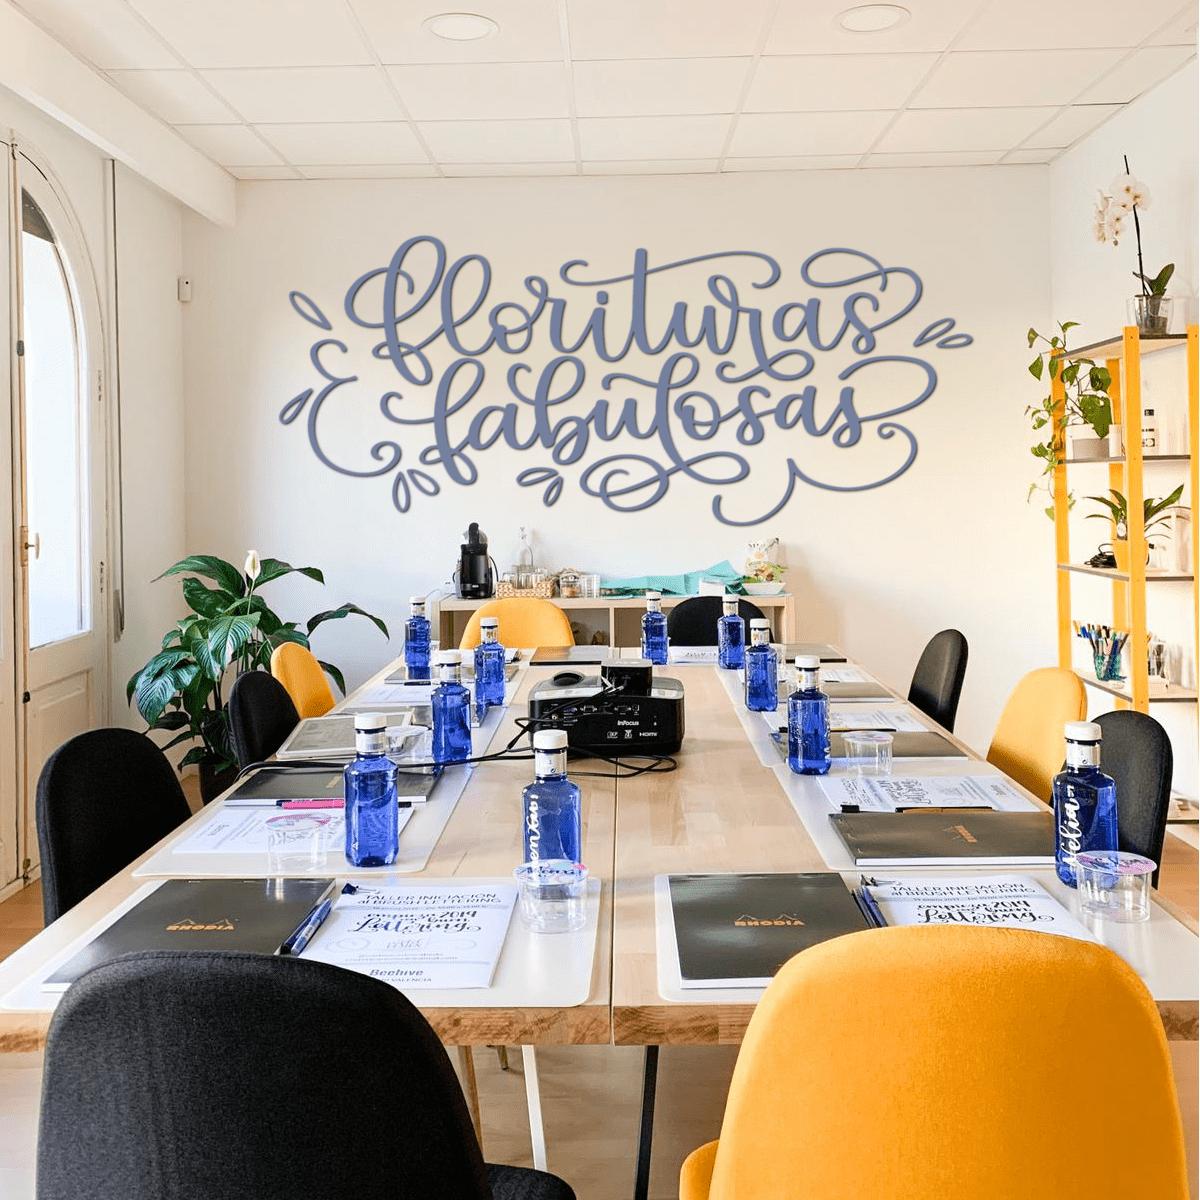 Taller presencial de brush lettering en Valencia - Florituras Fabulosas